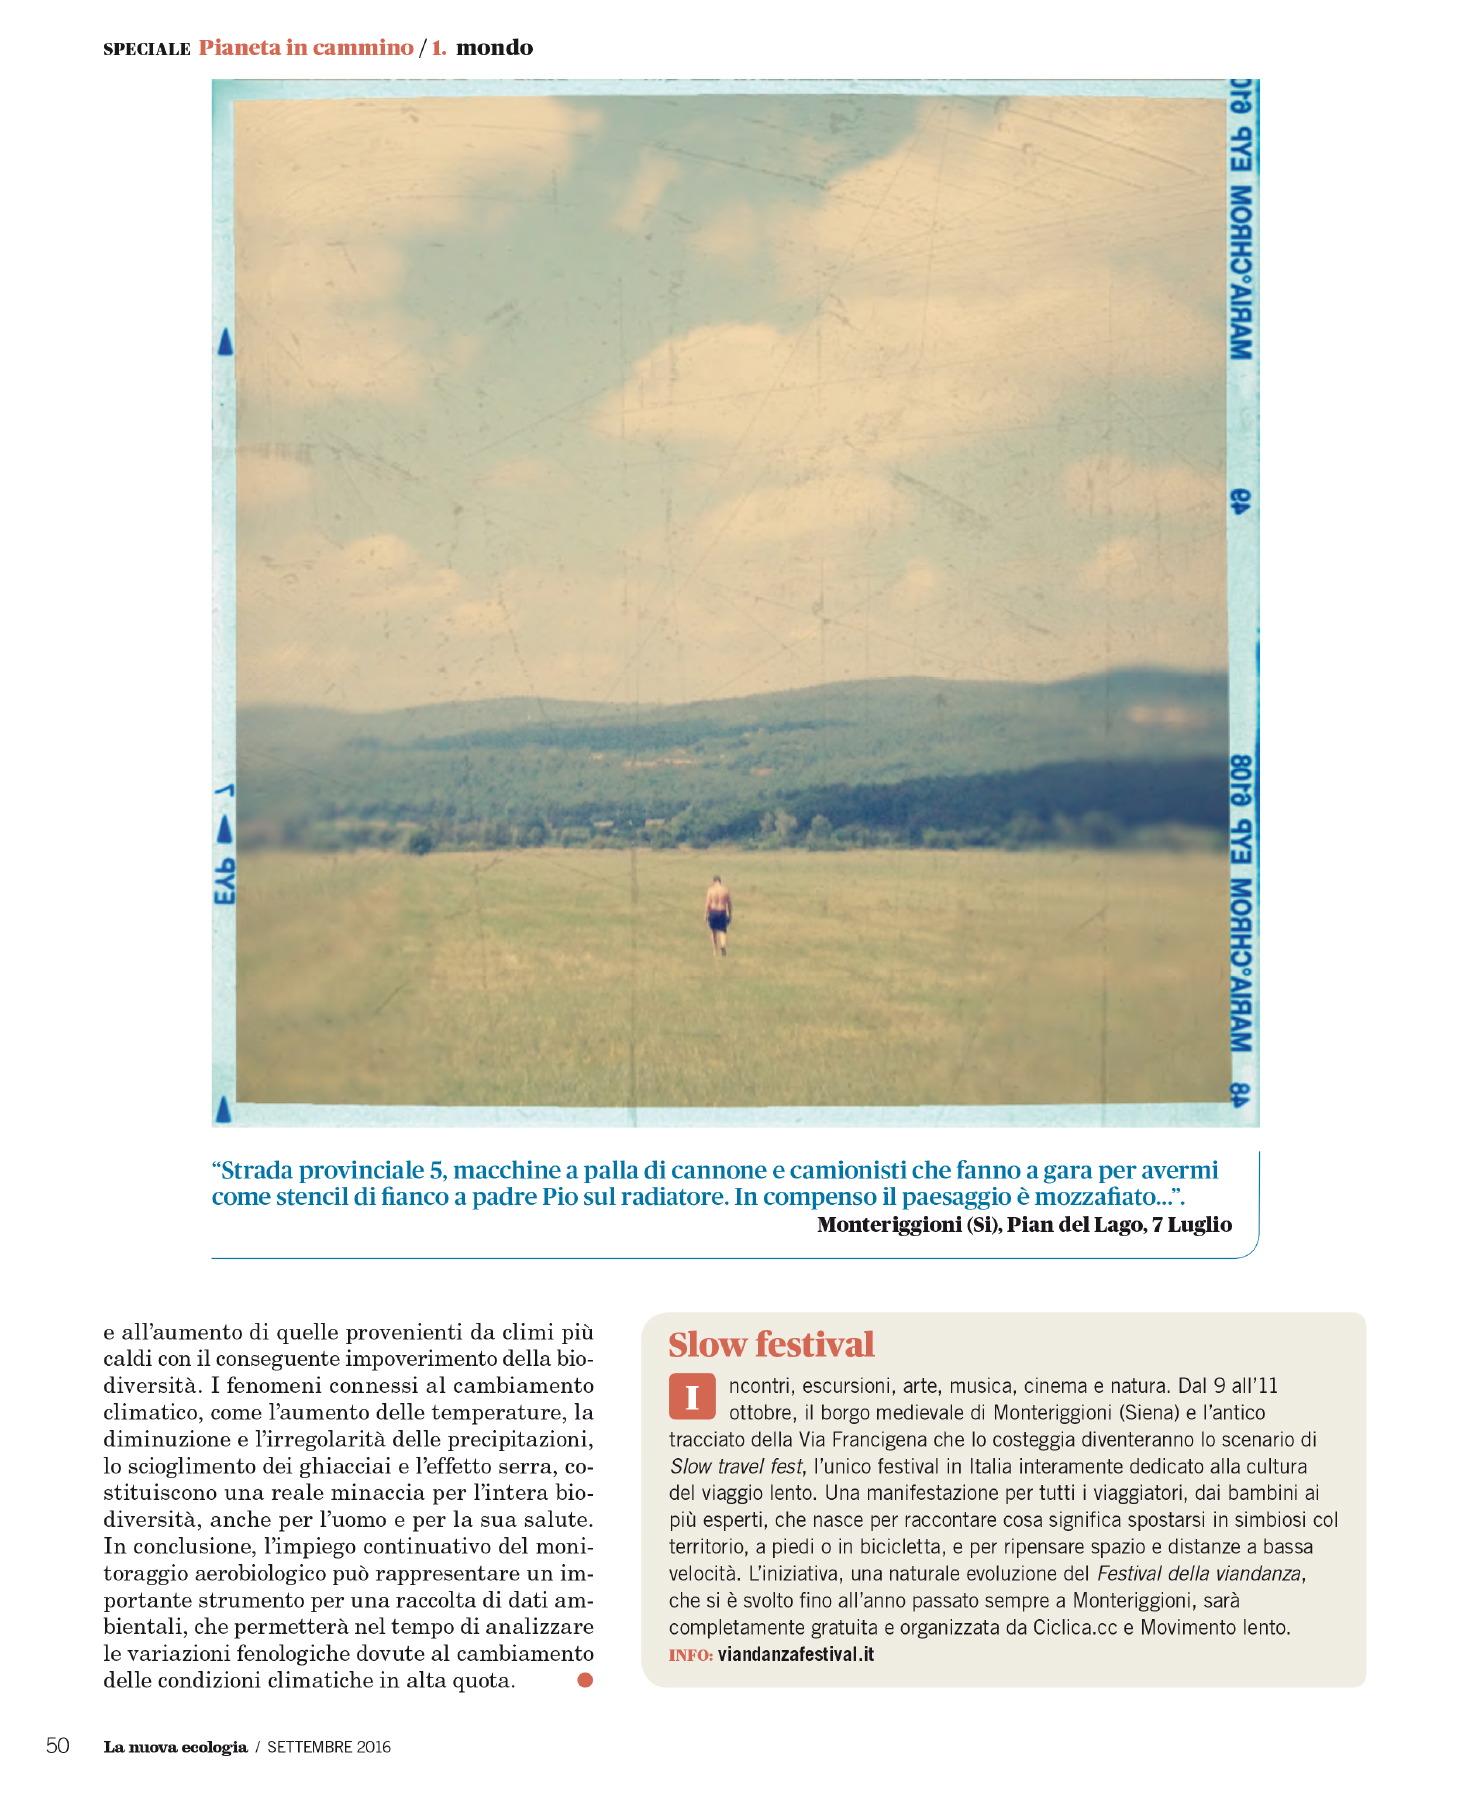 around-the-walk-_-pietro-vertamy-_tearsheet-nuova-ecologia-05